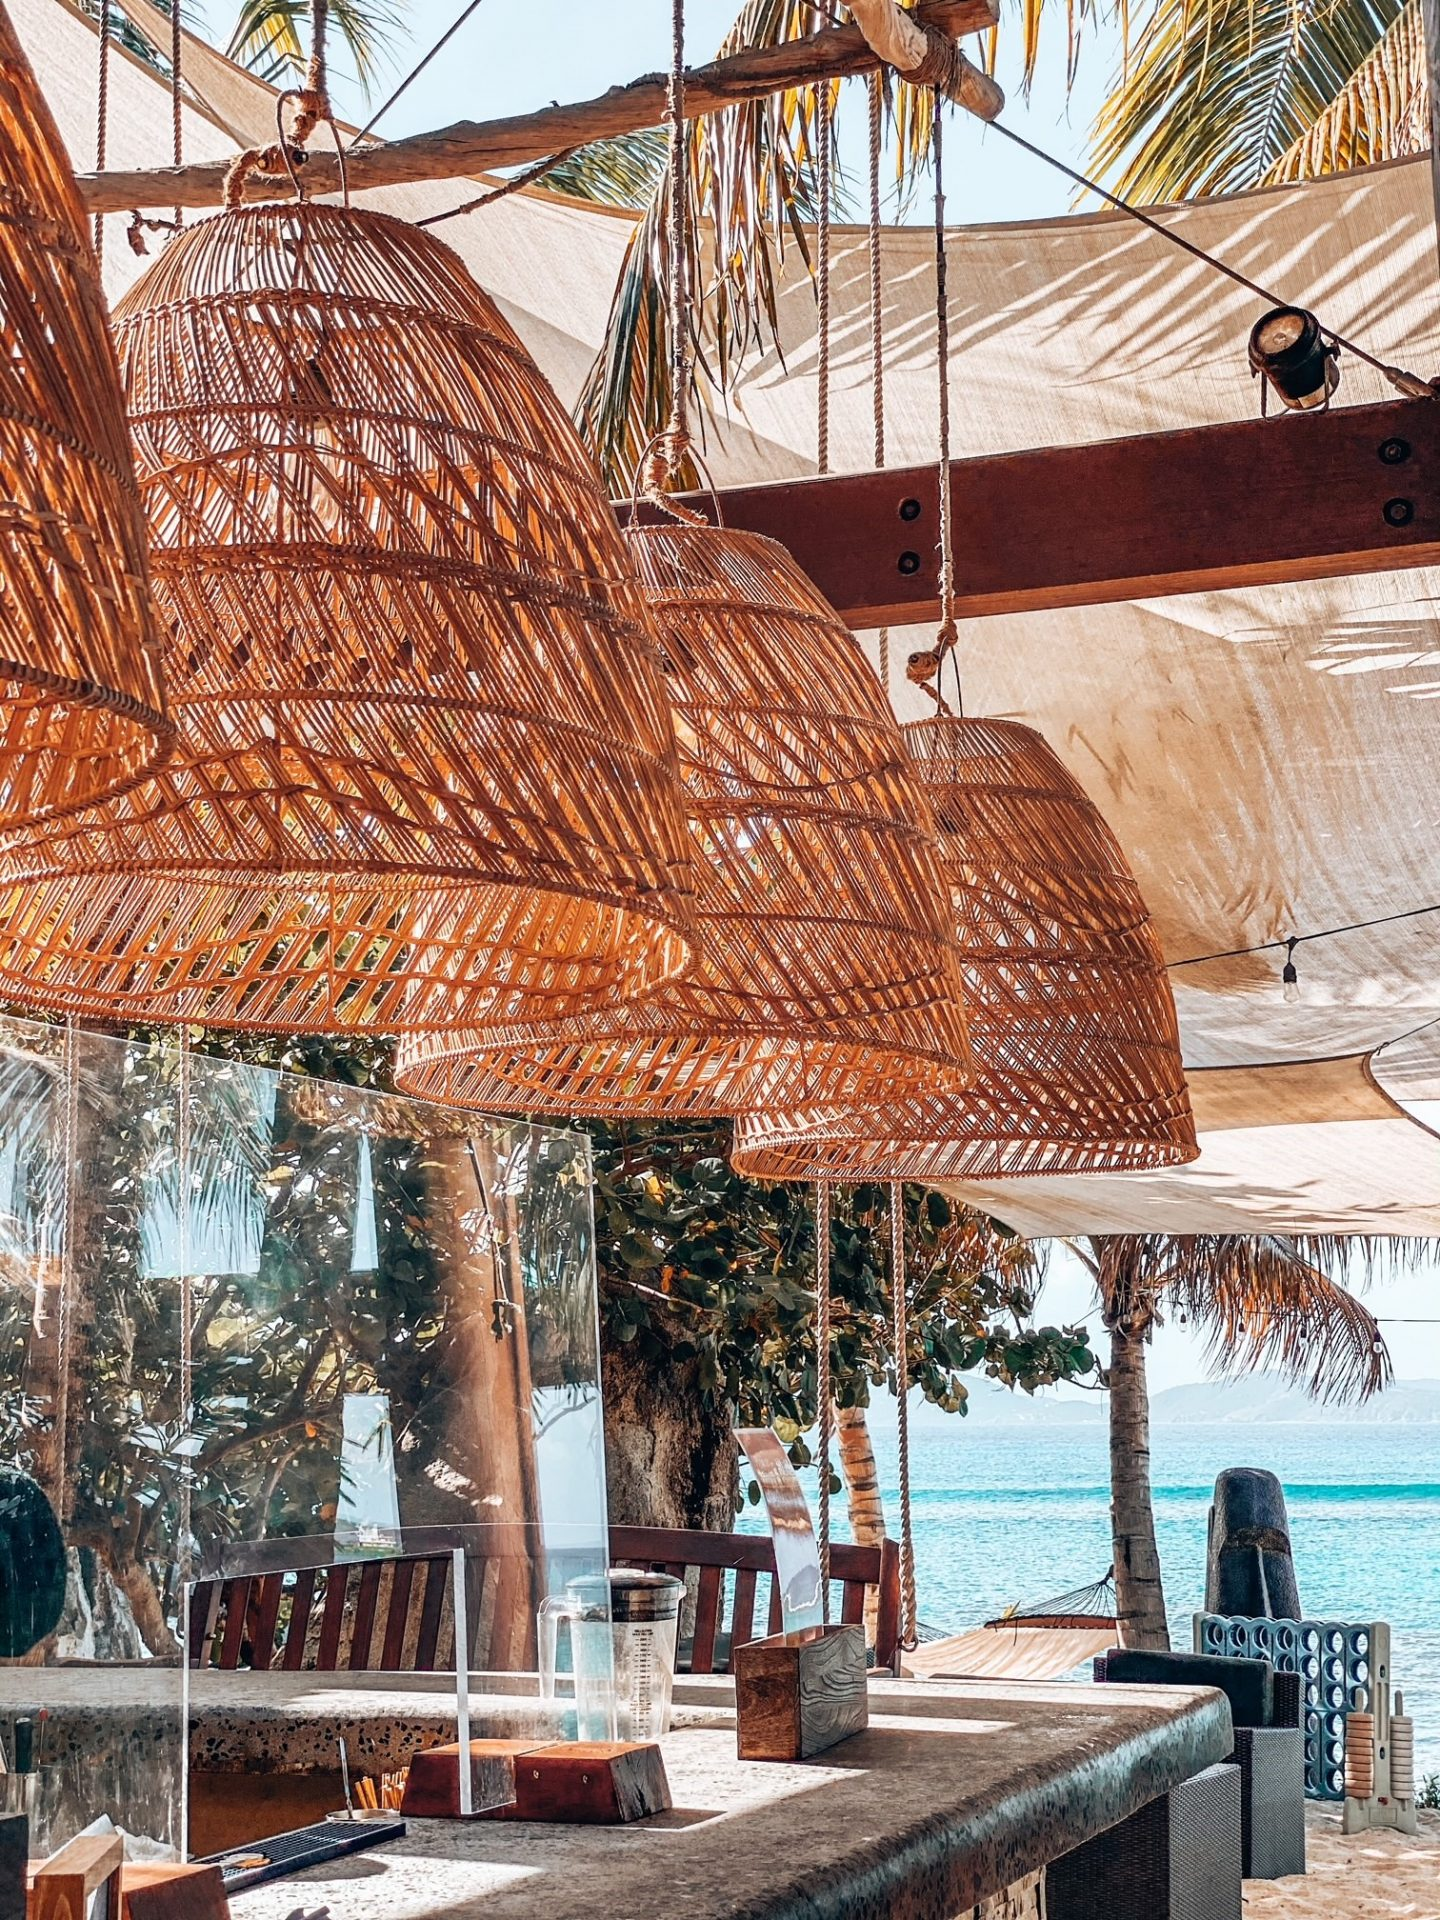 CocoMaya Restaurant - Virgin Gorda, British Virgin Islands